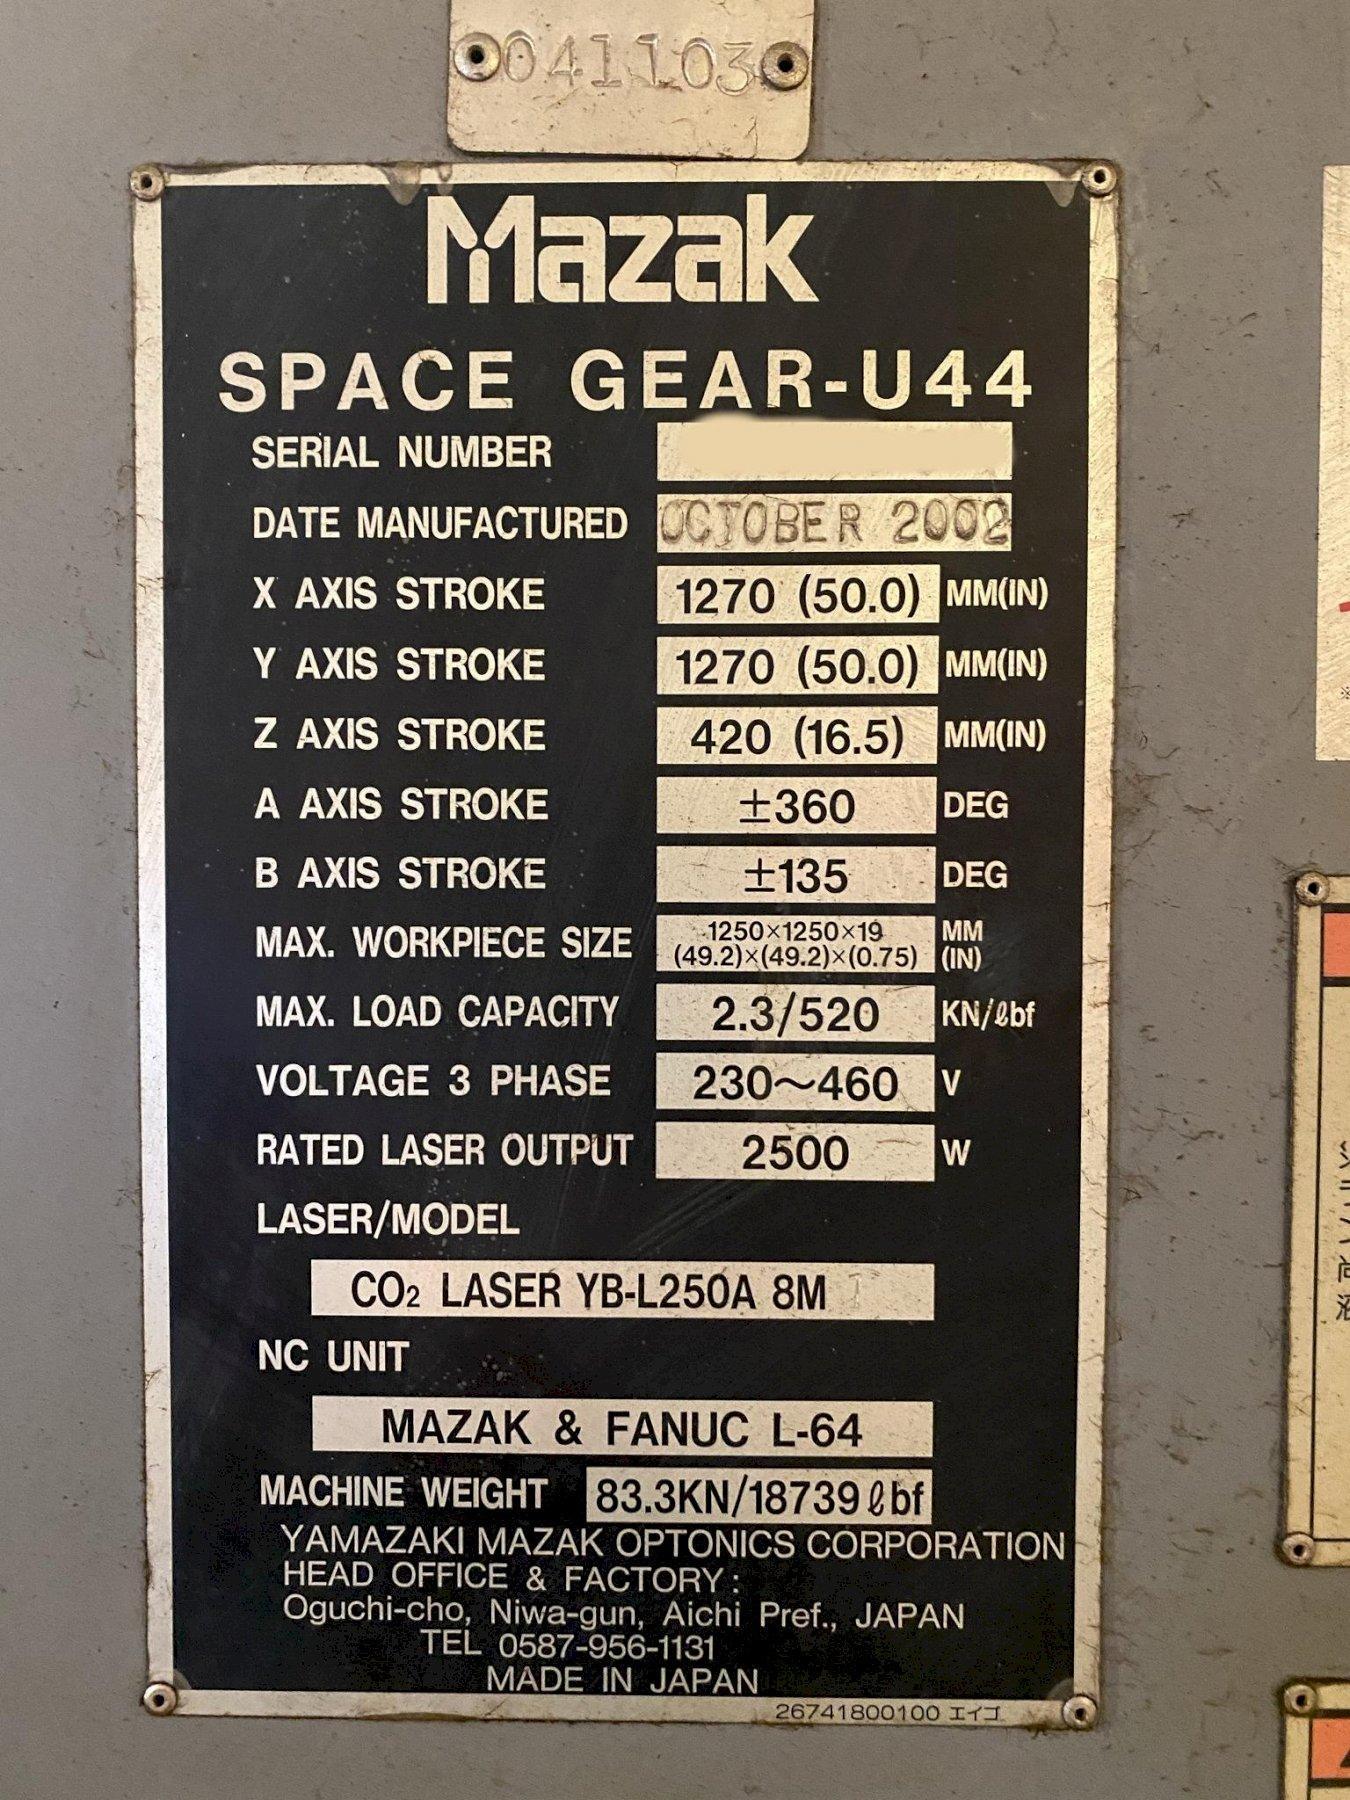 USED MAZAK SPACEGEAR MODEL U44 2,500 WATT FLYING OPTICS CO2 LASER, Year 2002, Stock # 10823